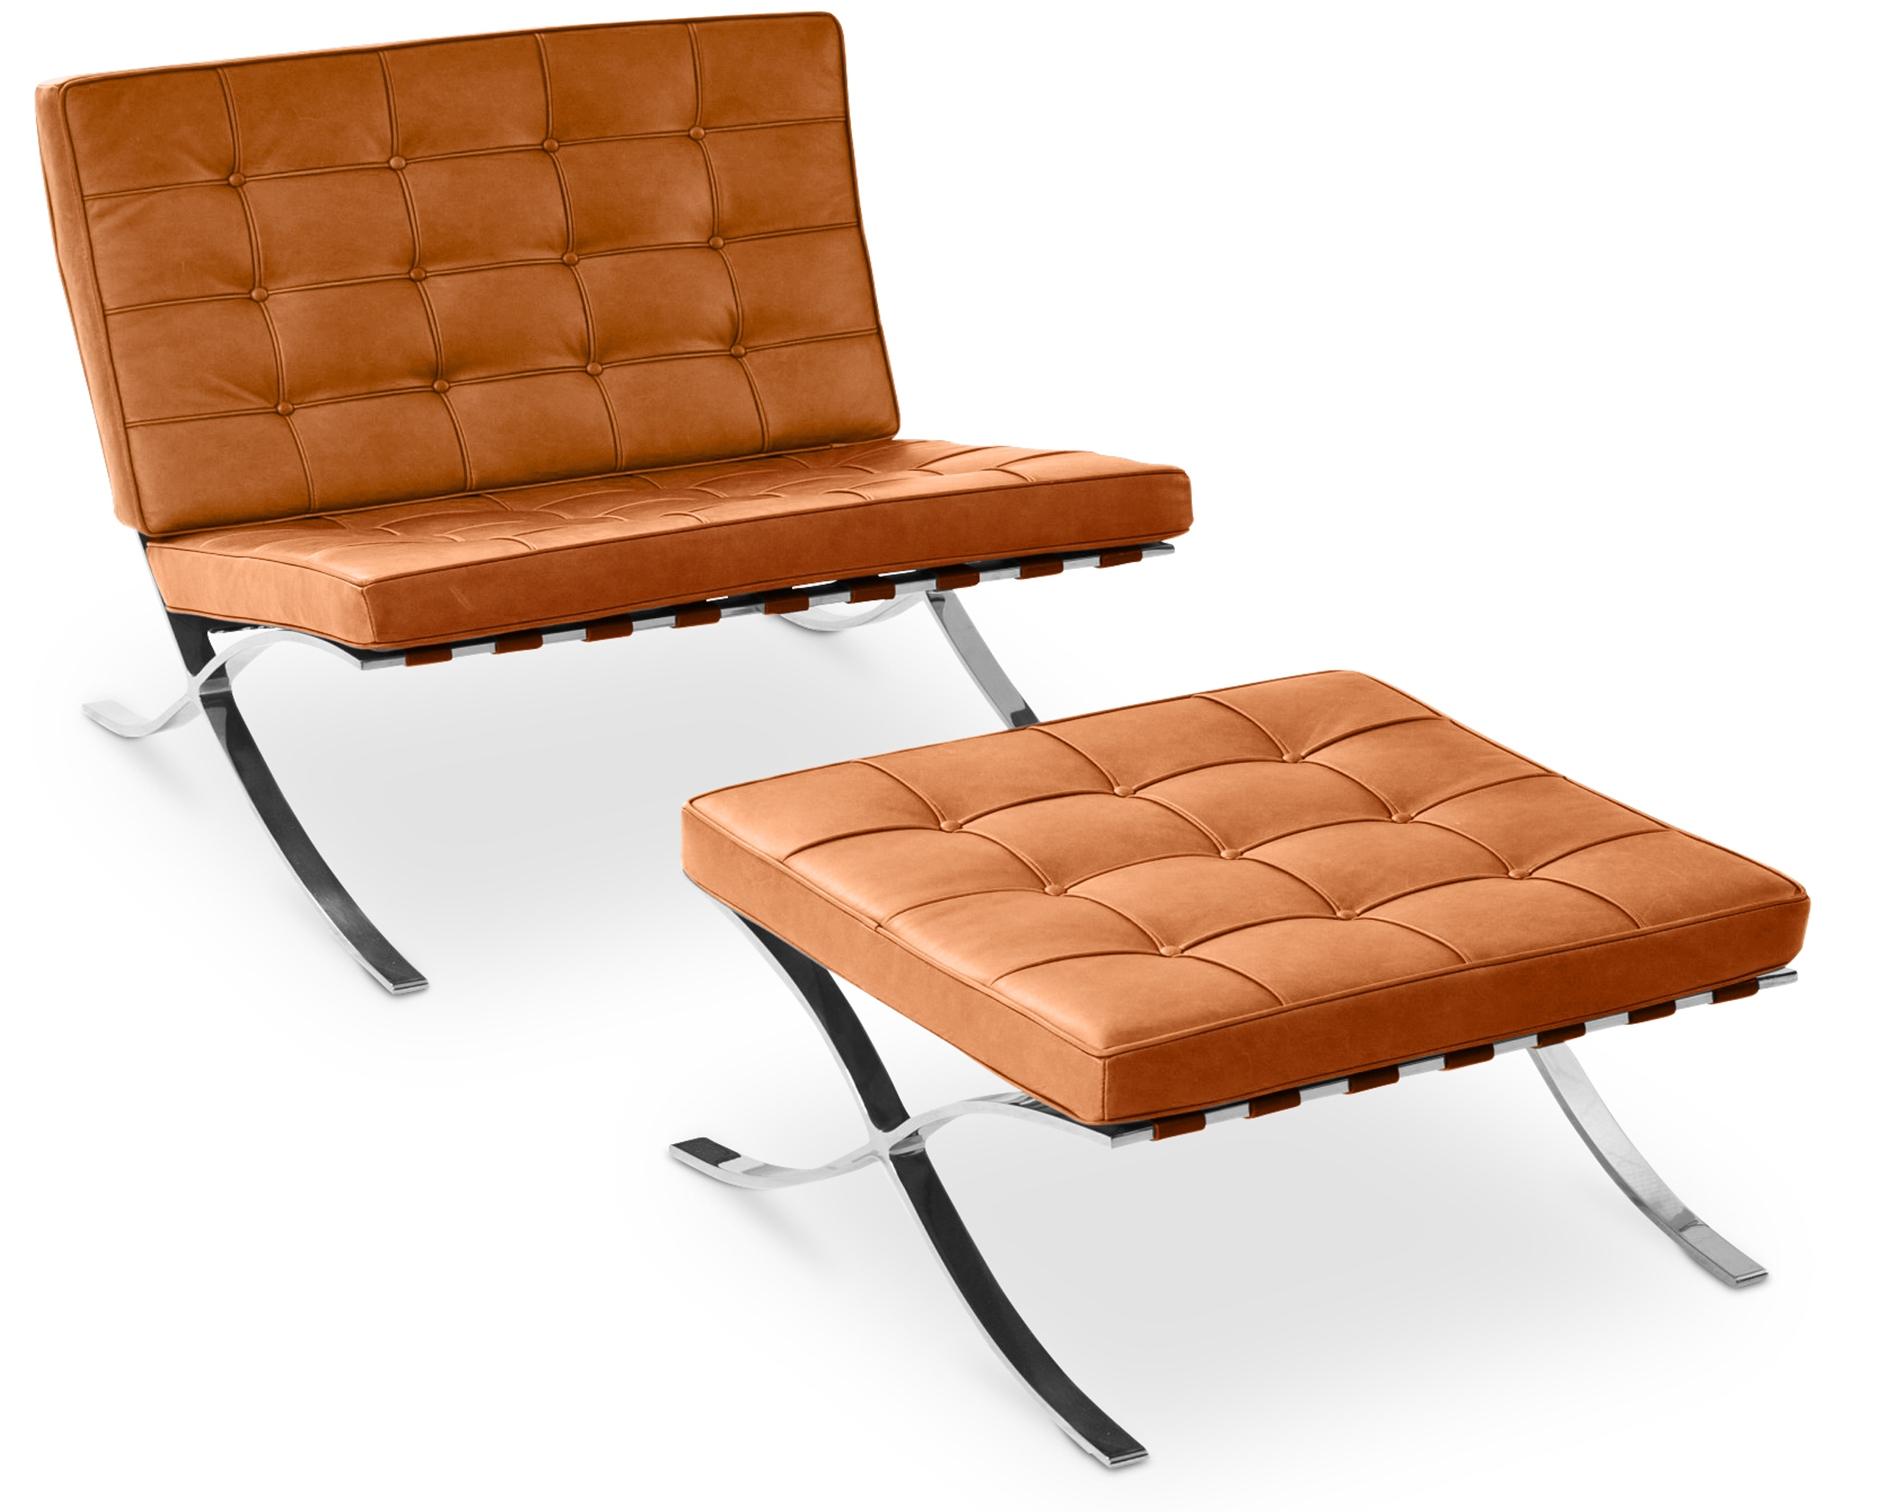 fauteuil avec ottoman capitonn cuir camel cubik. Black Bedroom Furniture Sets. Home Design Ideas